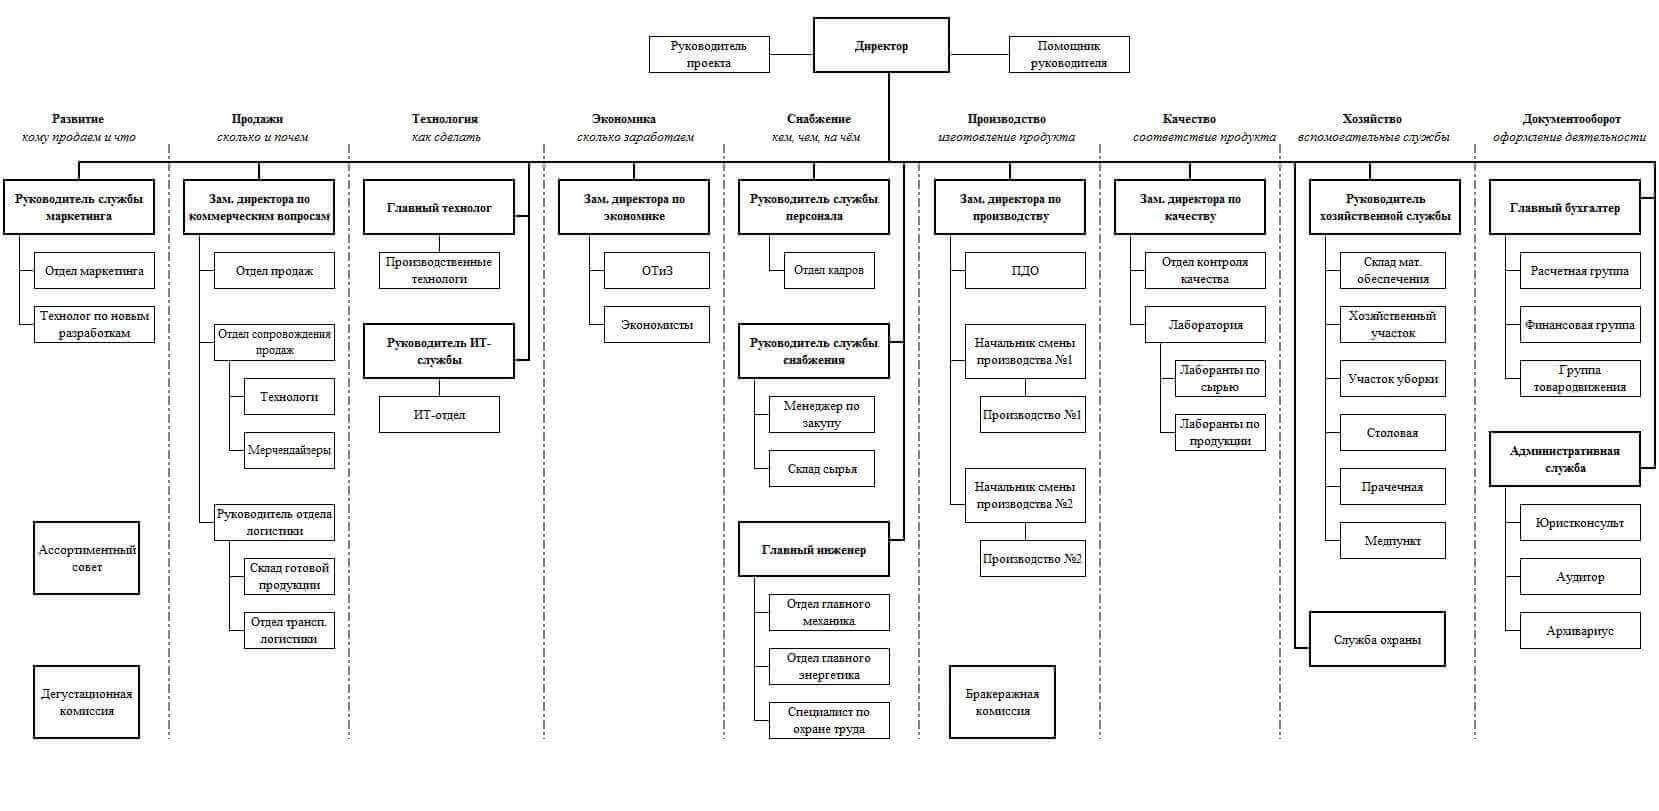 Структура подразделений предприятия схема фото 135